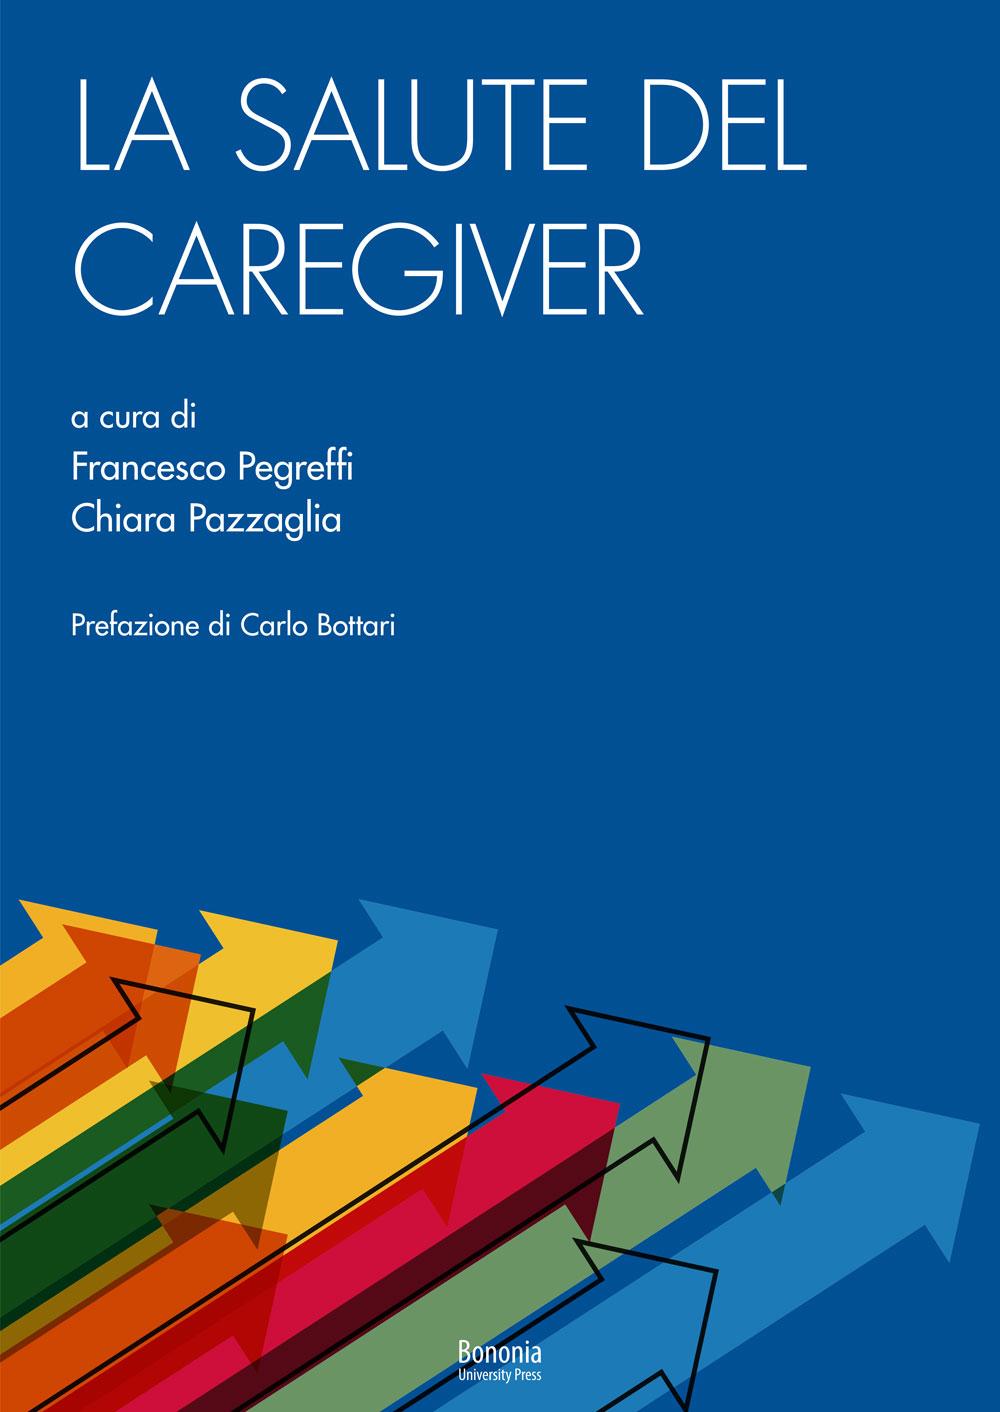 La salute del caregiver - Bononia University Press